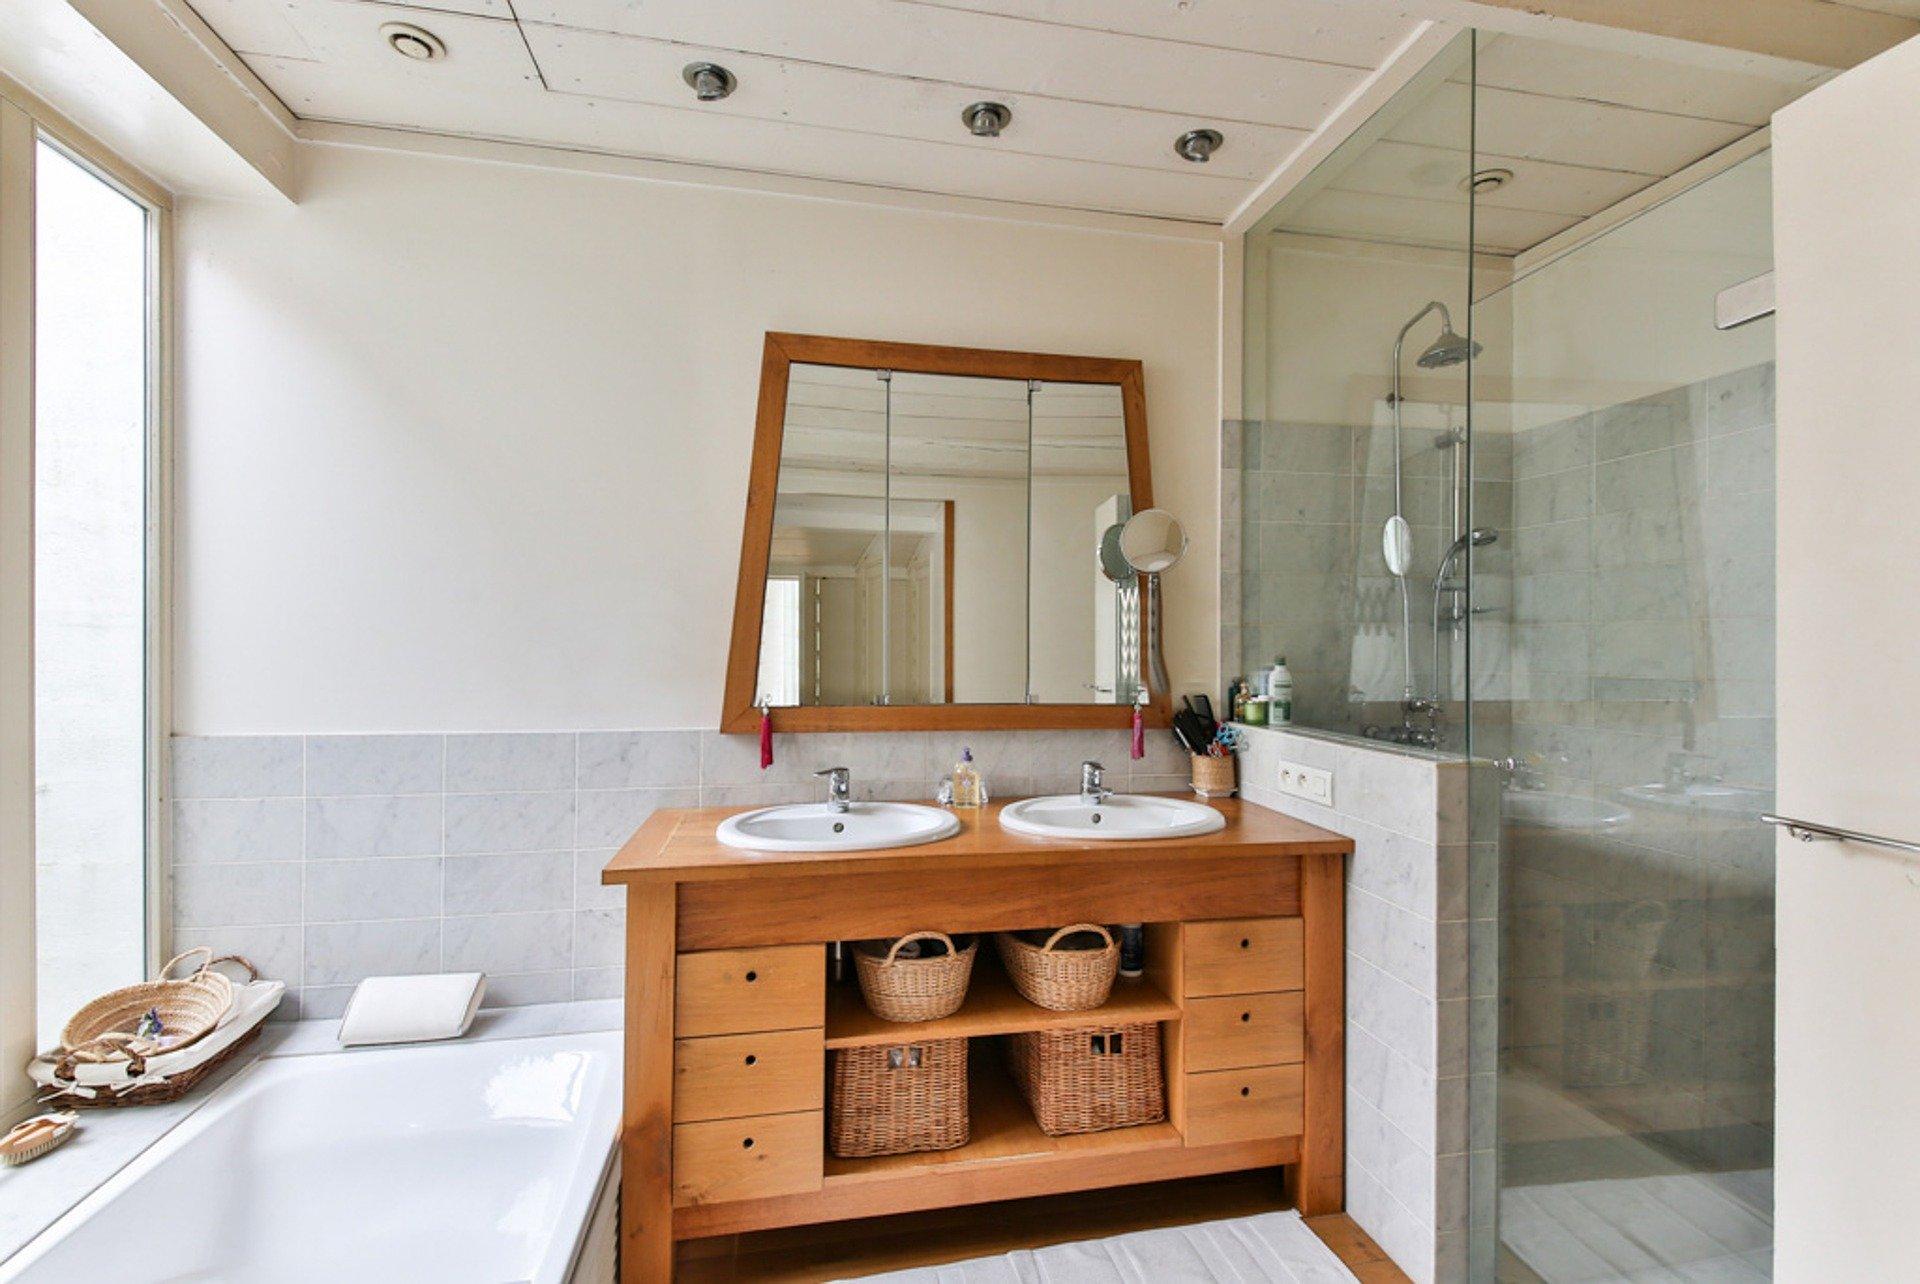 Décorer sa salle de bain : Les tendances